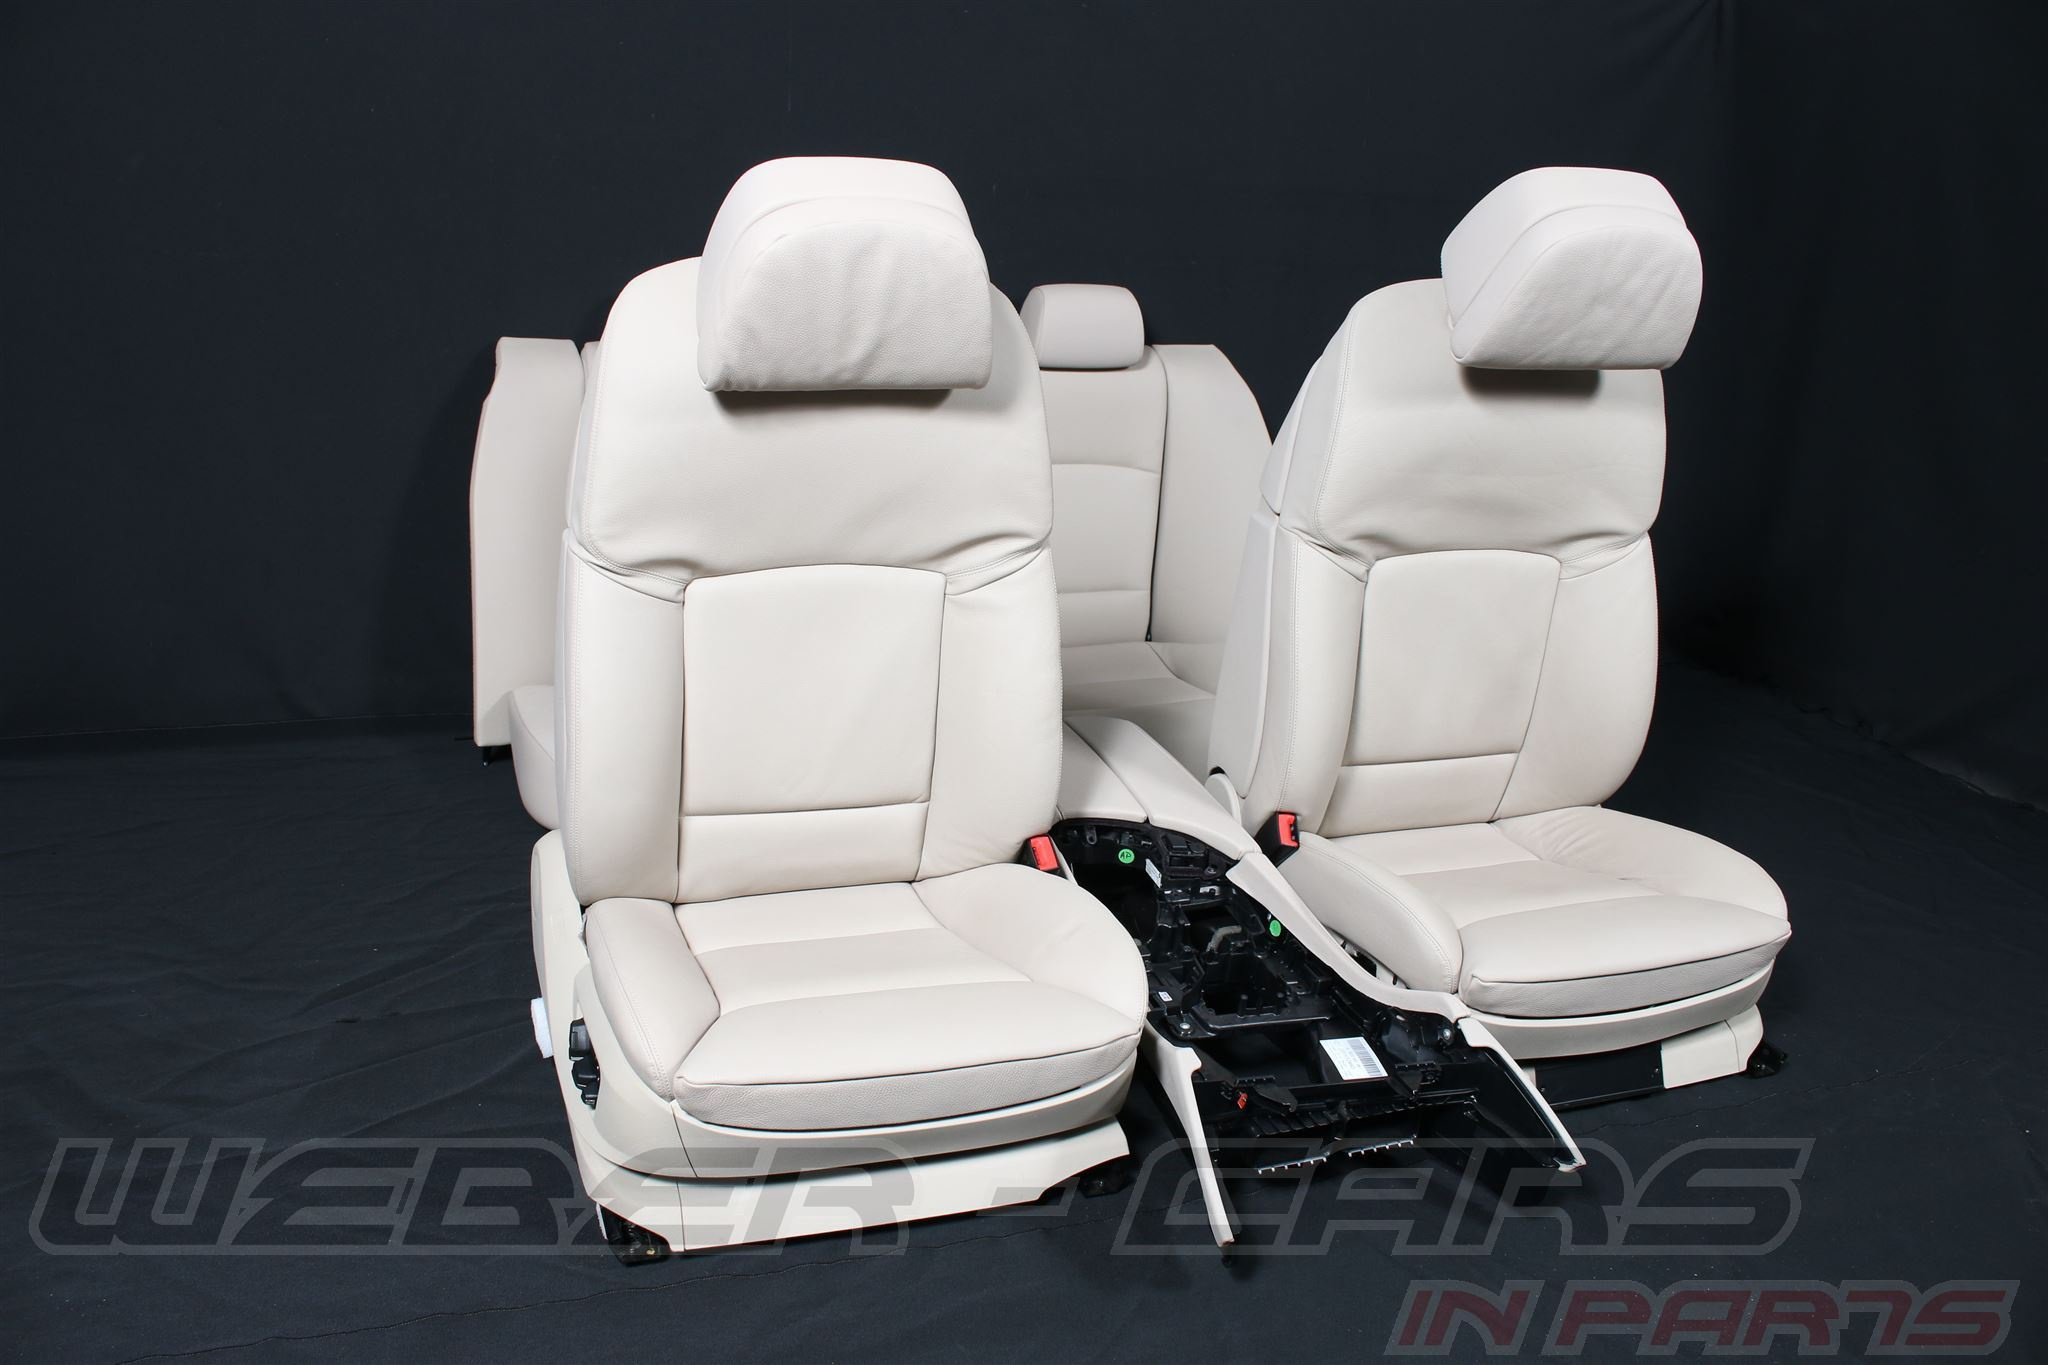 bmw 5er f10 limo komfort sitze lederausstattung dakota. Black Bedroom Furniture Sets. Home Design Ideas